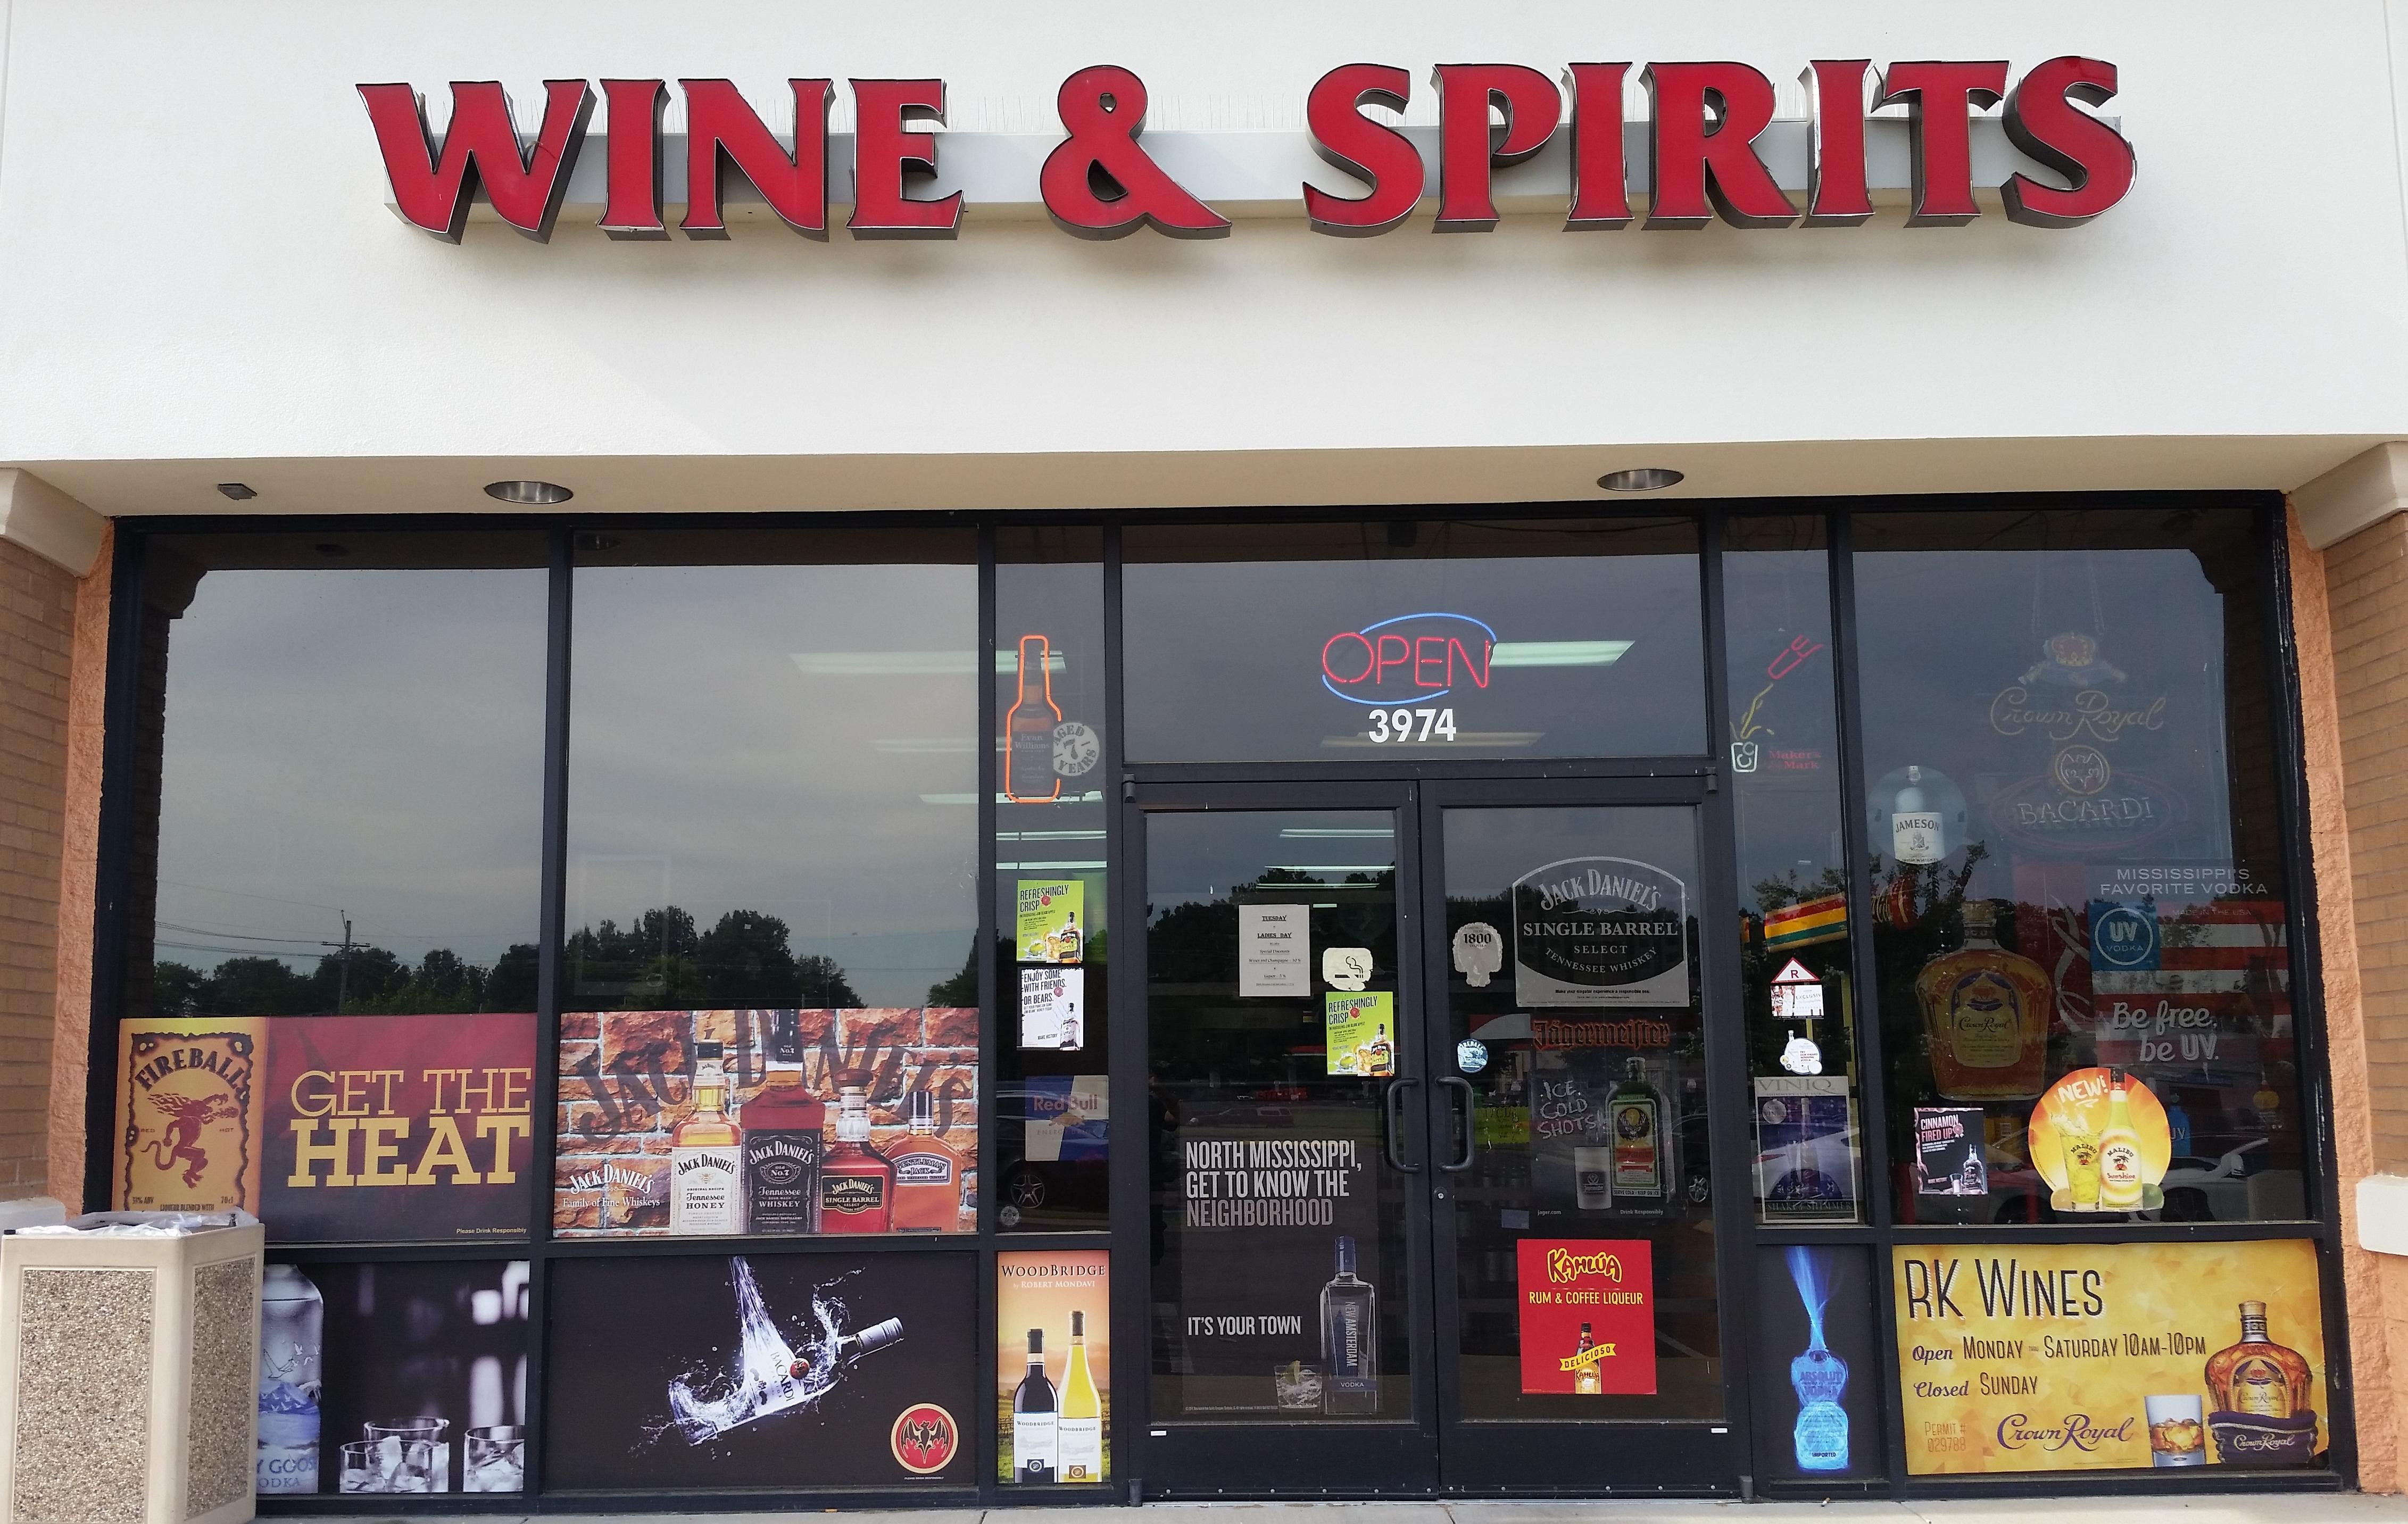 RK Wines